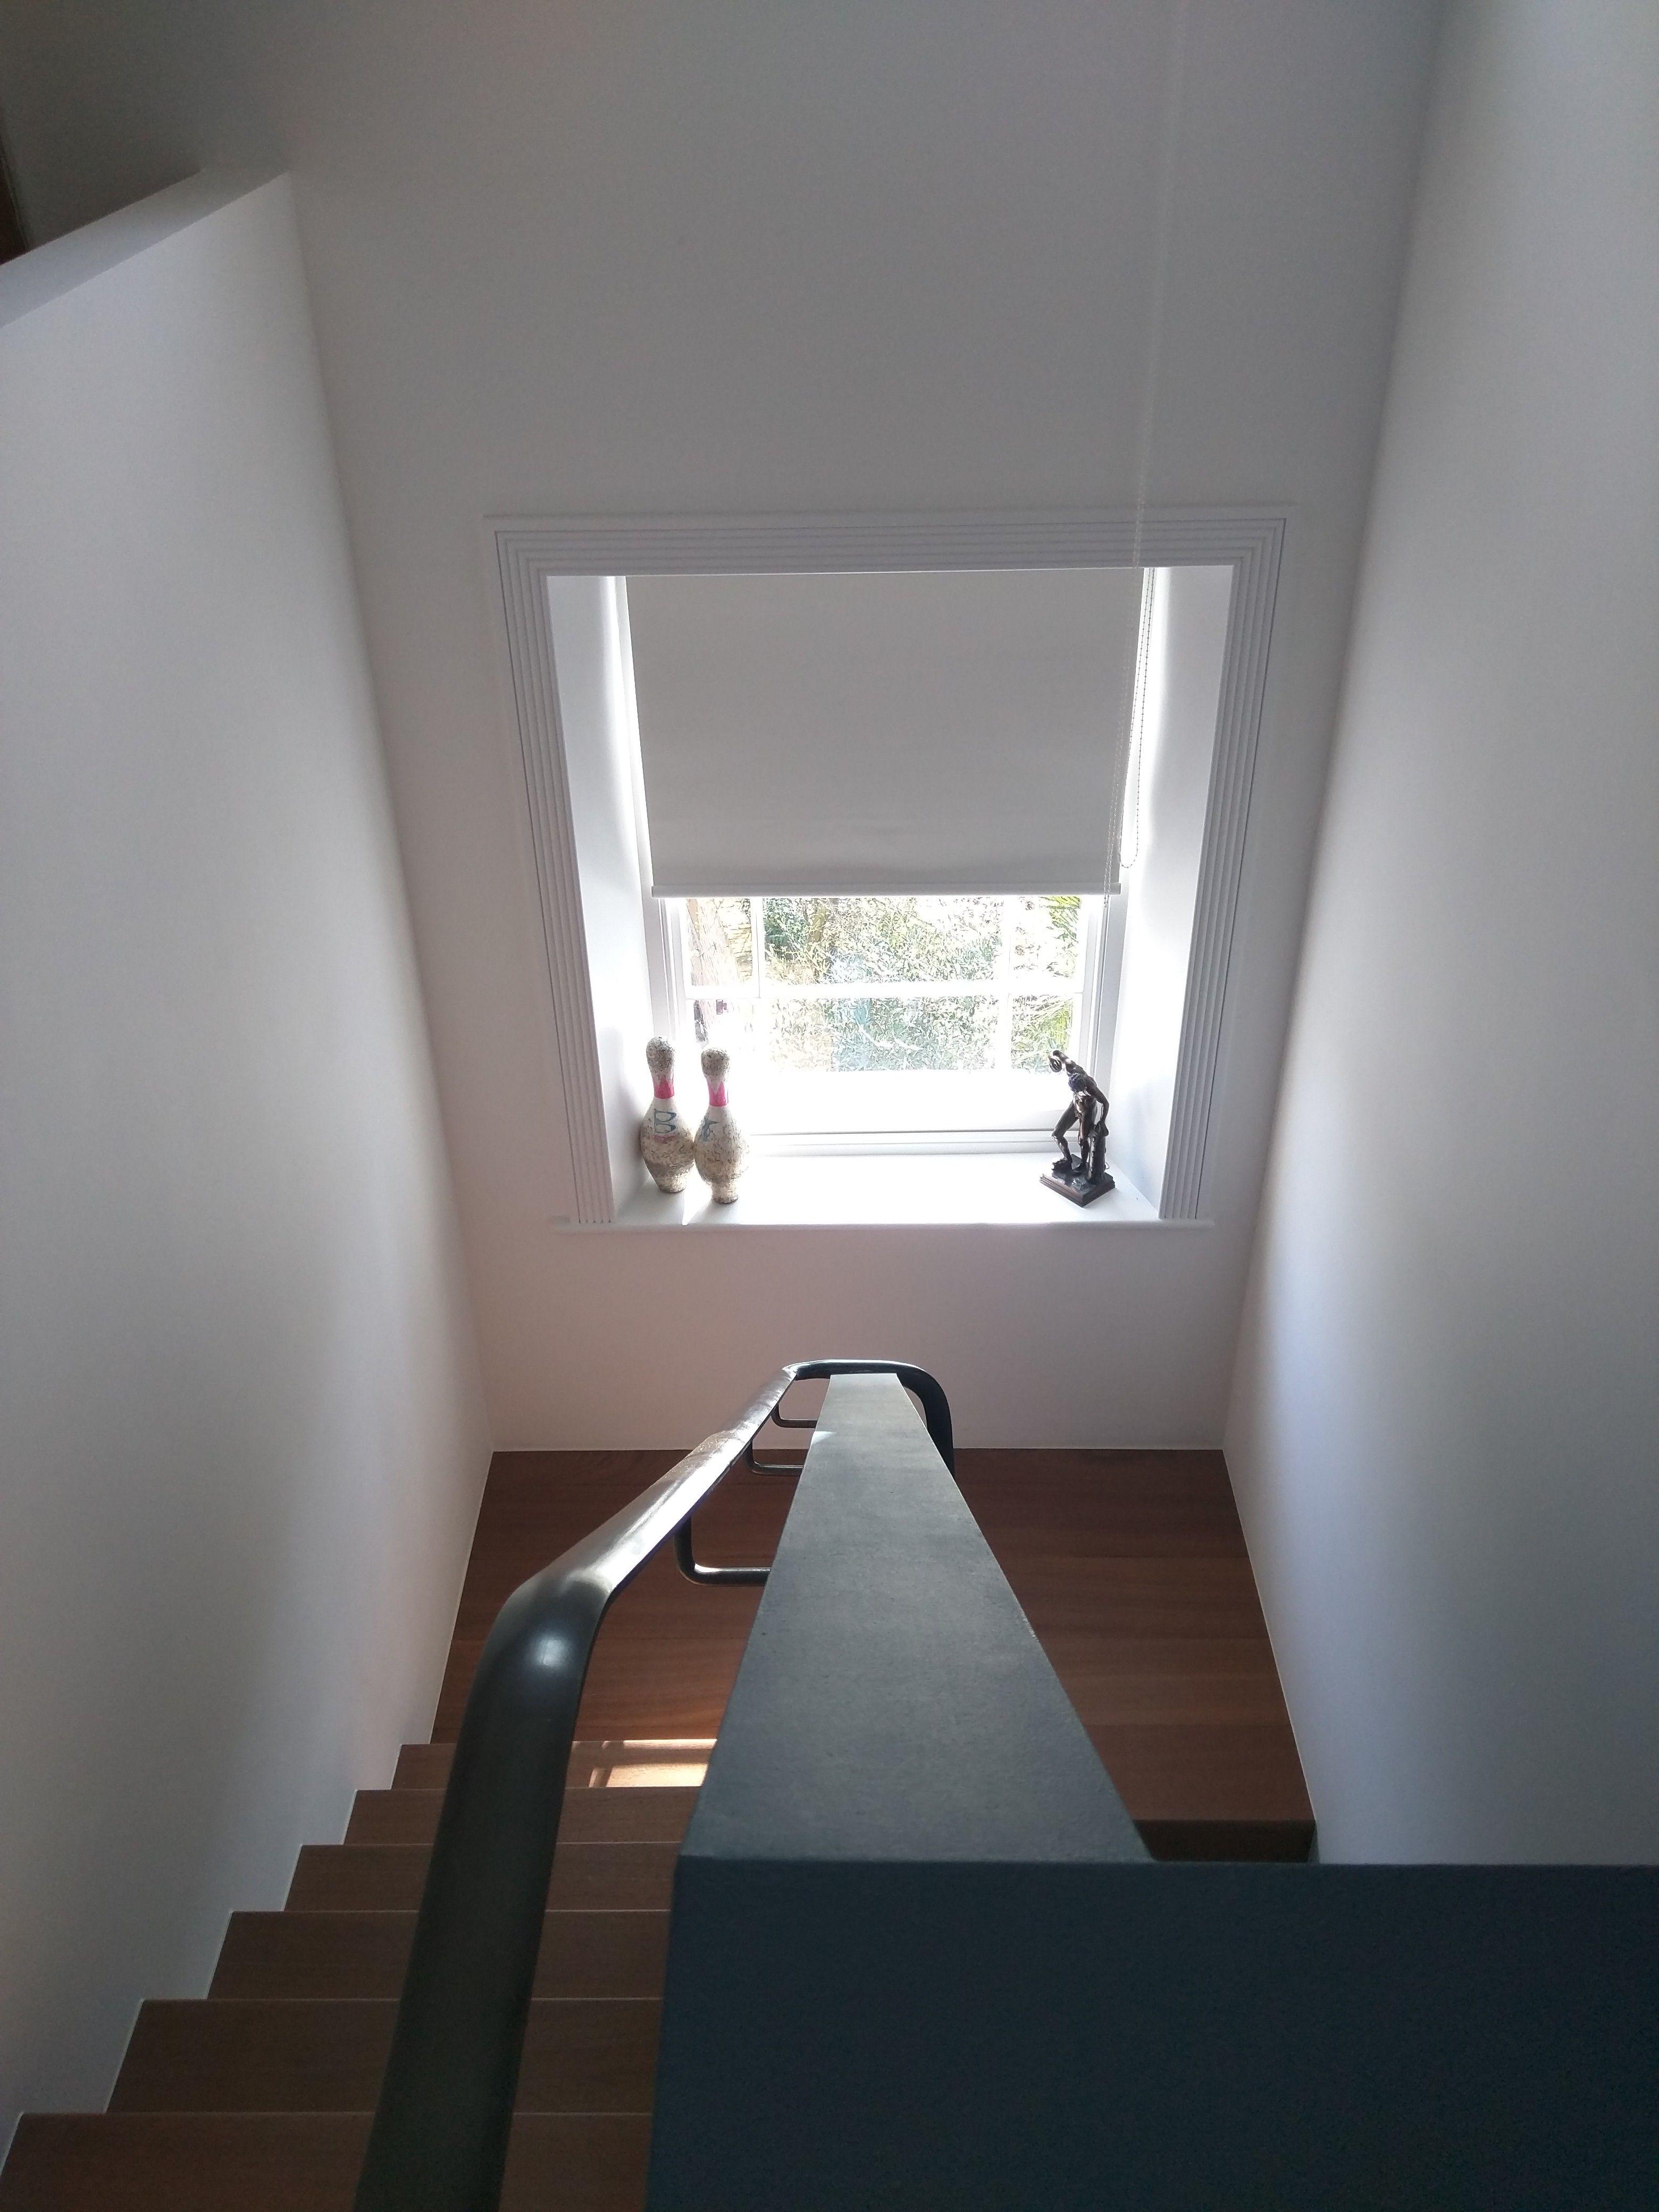 Staircase Blinds - Blackout Roller Blind - Sash Window Blind